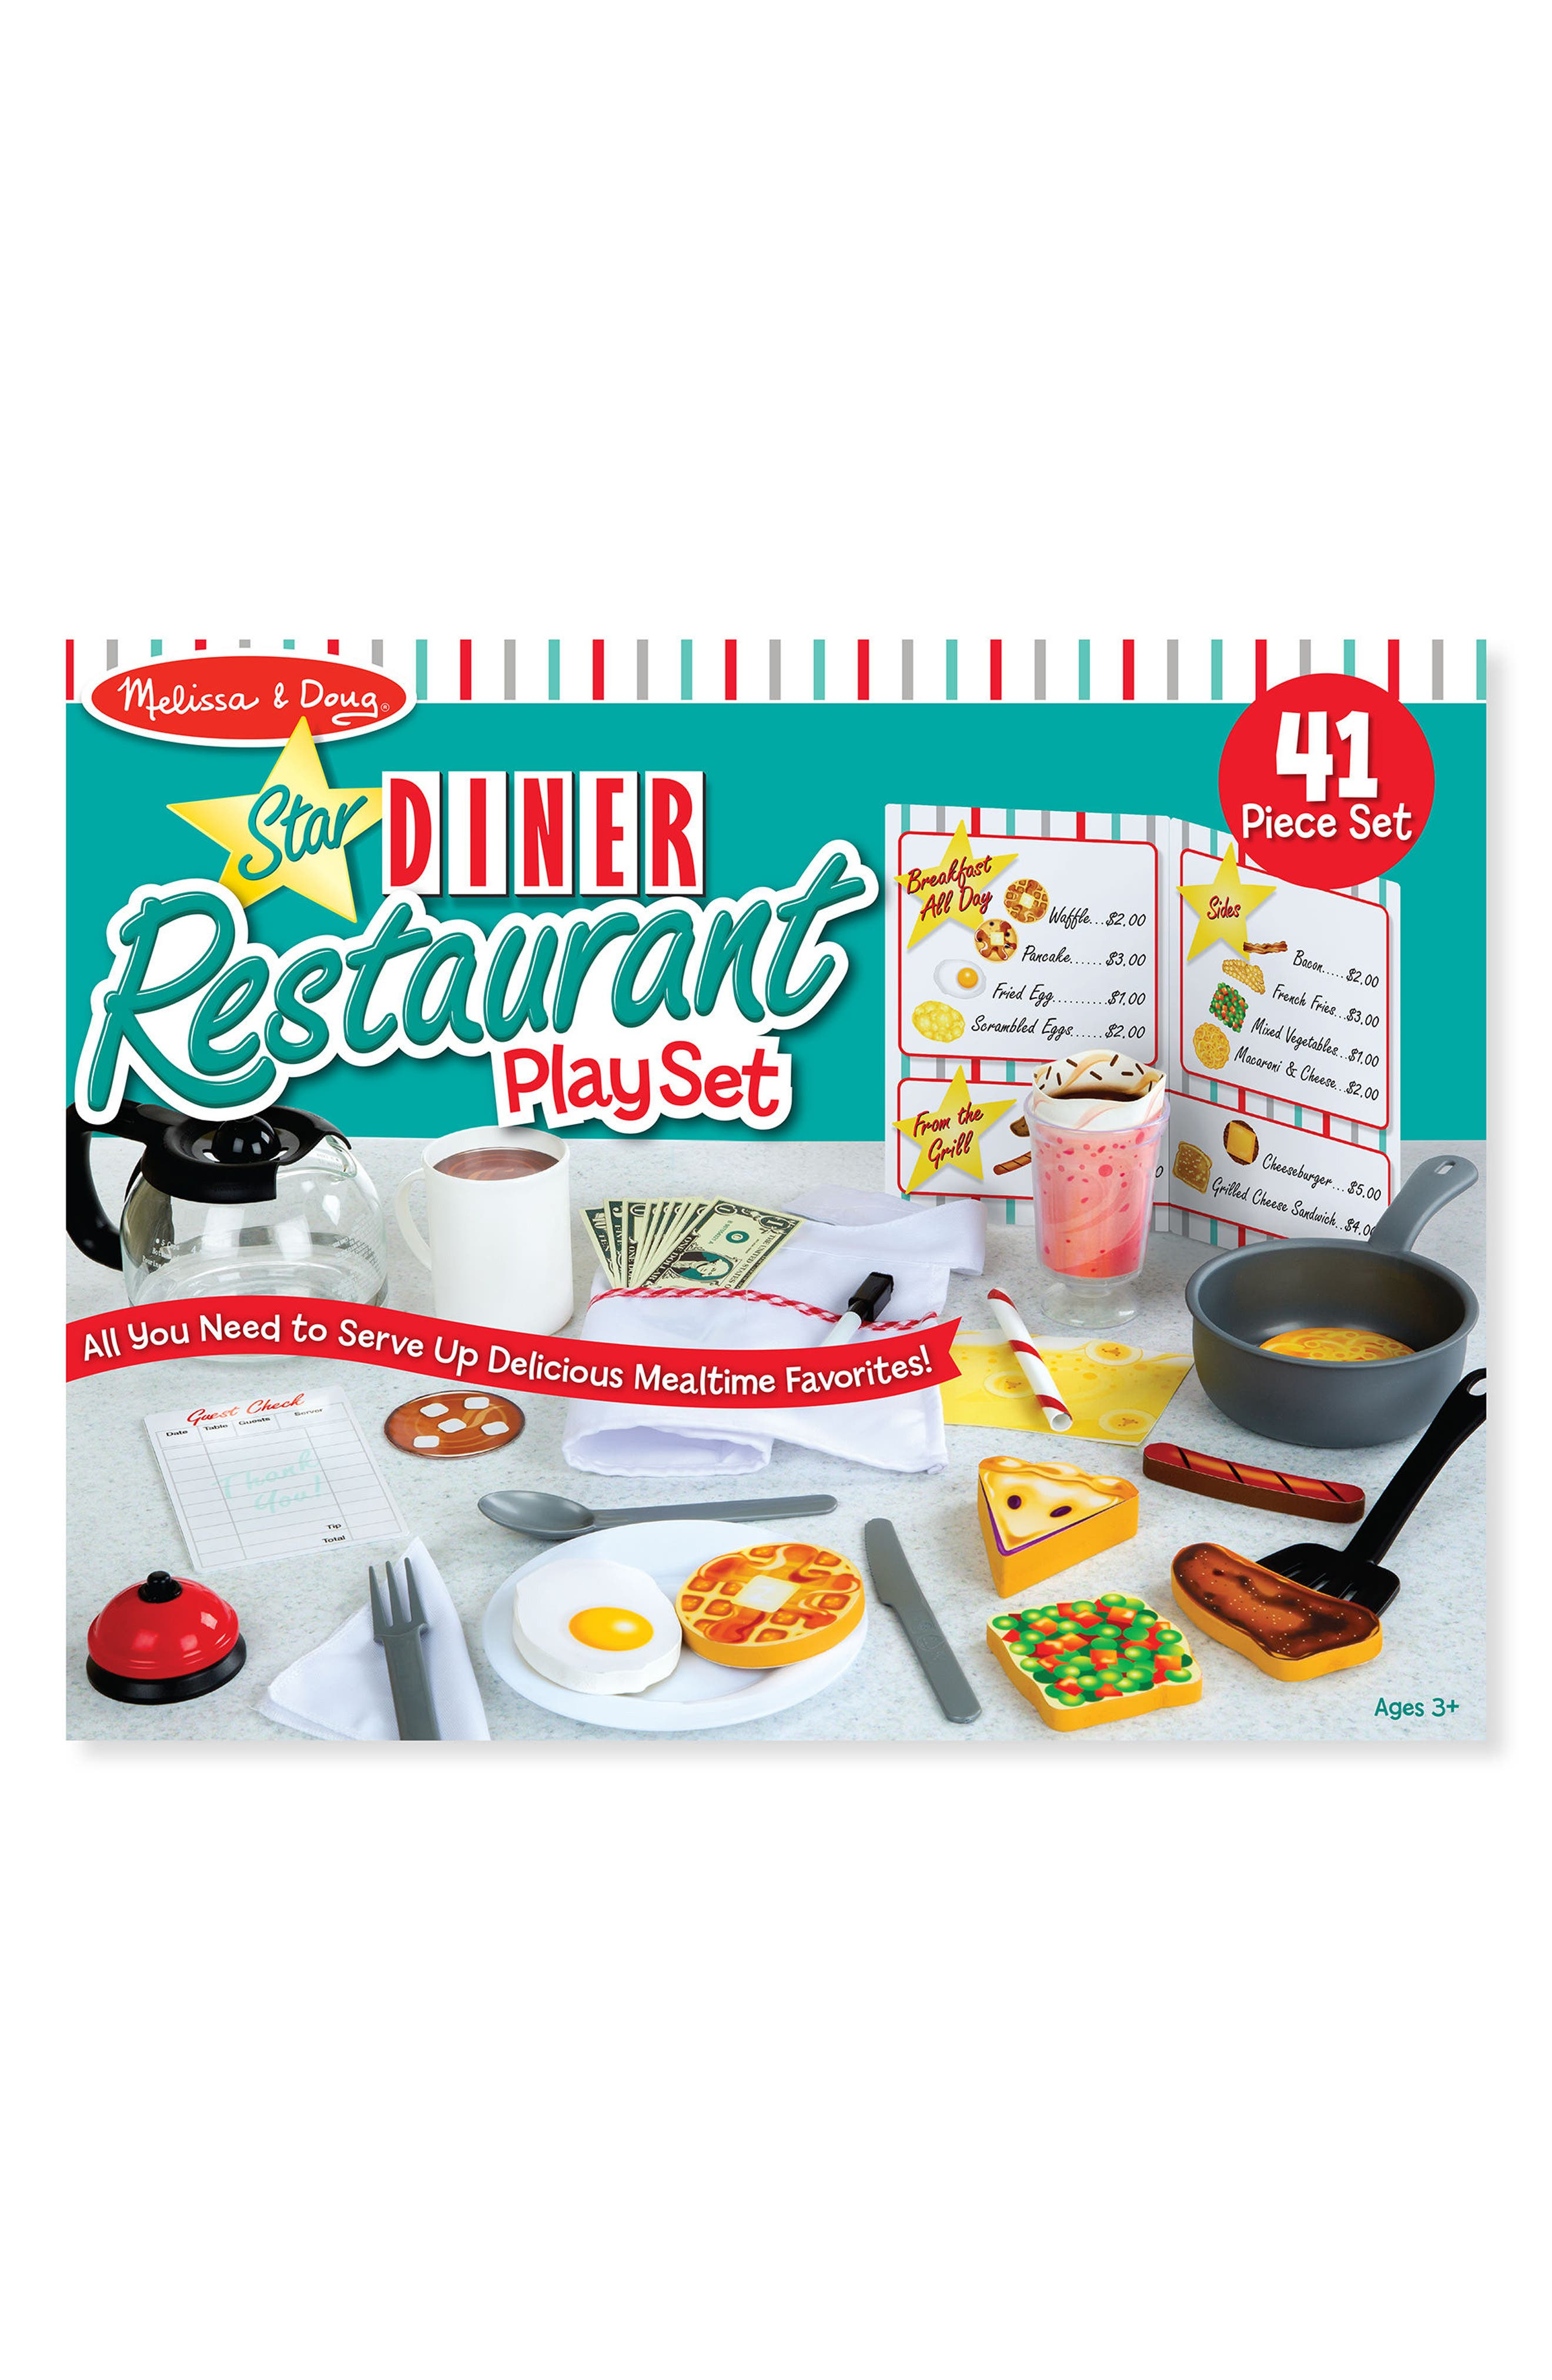 MELISSA & DOUG 41-Piece Star Diner Restaurant Play Set, Main, color, WHITE